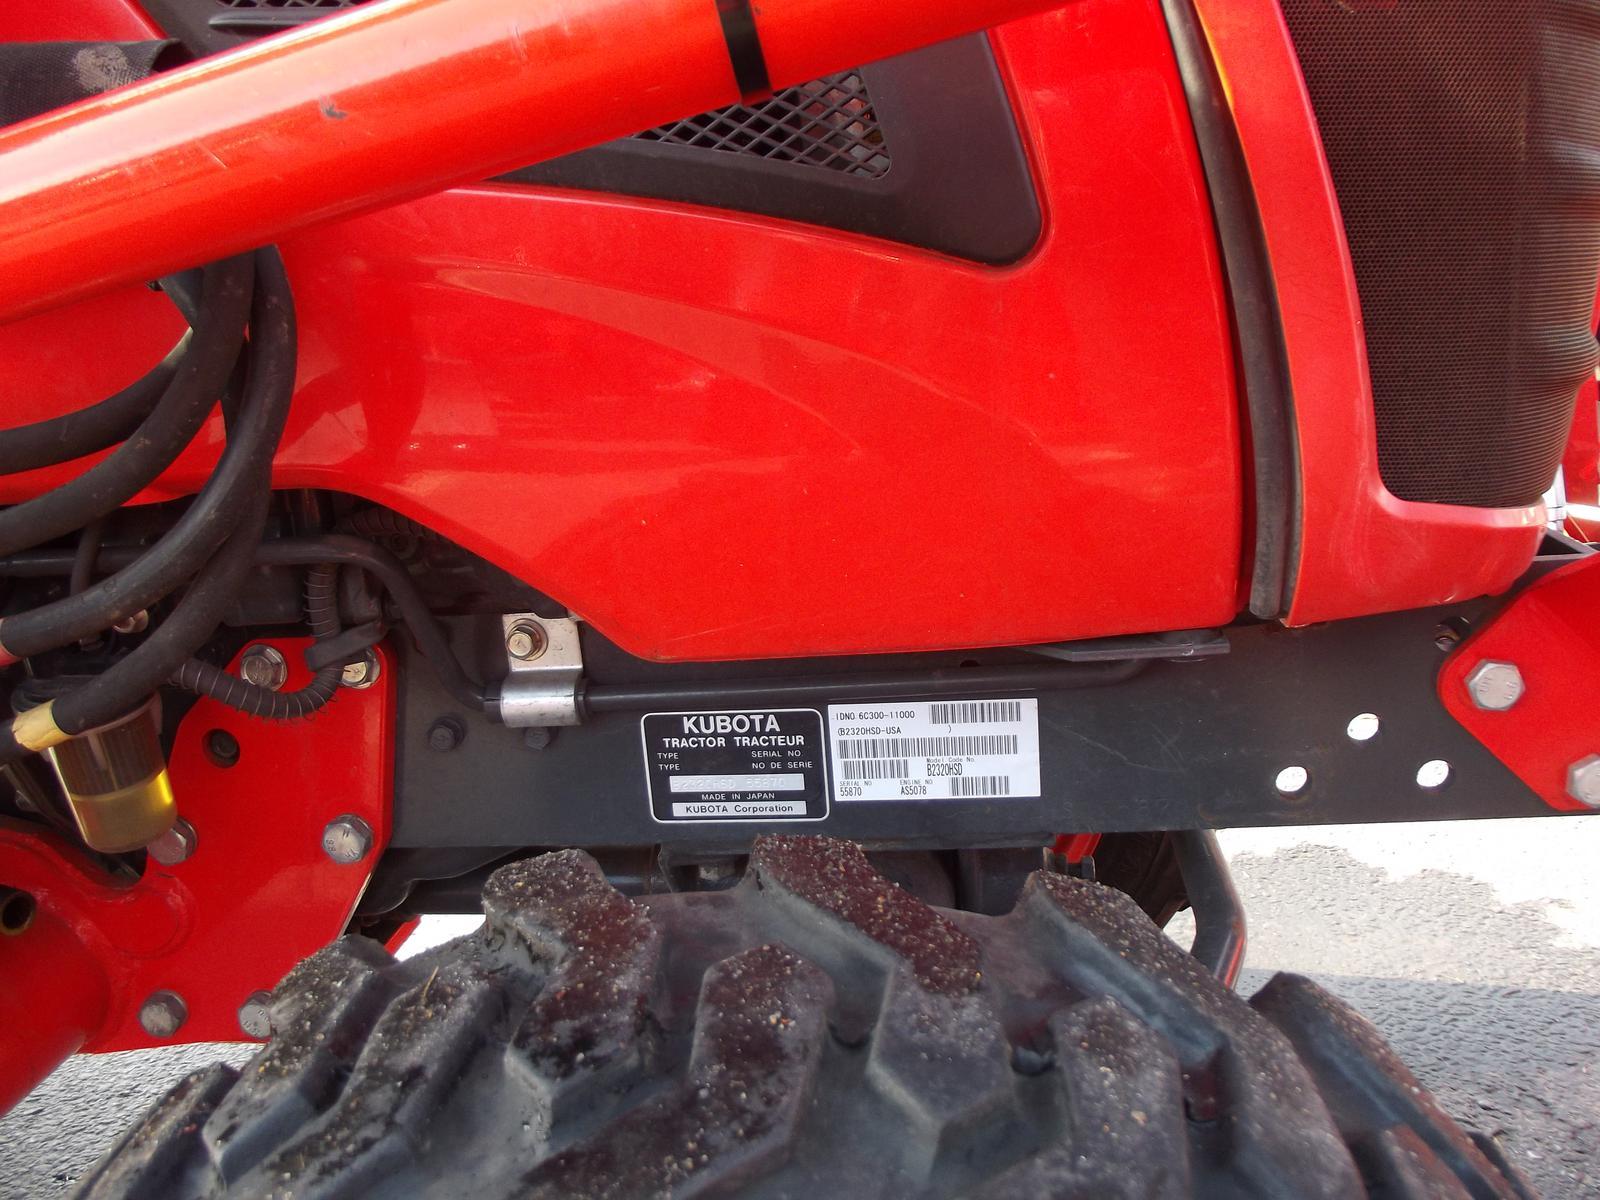 2012 Kubota B2320 - Hydrostatic Transmission for sale in